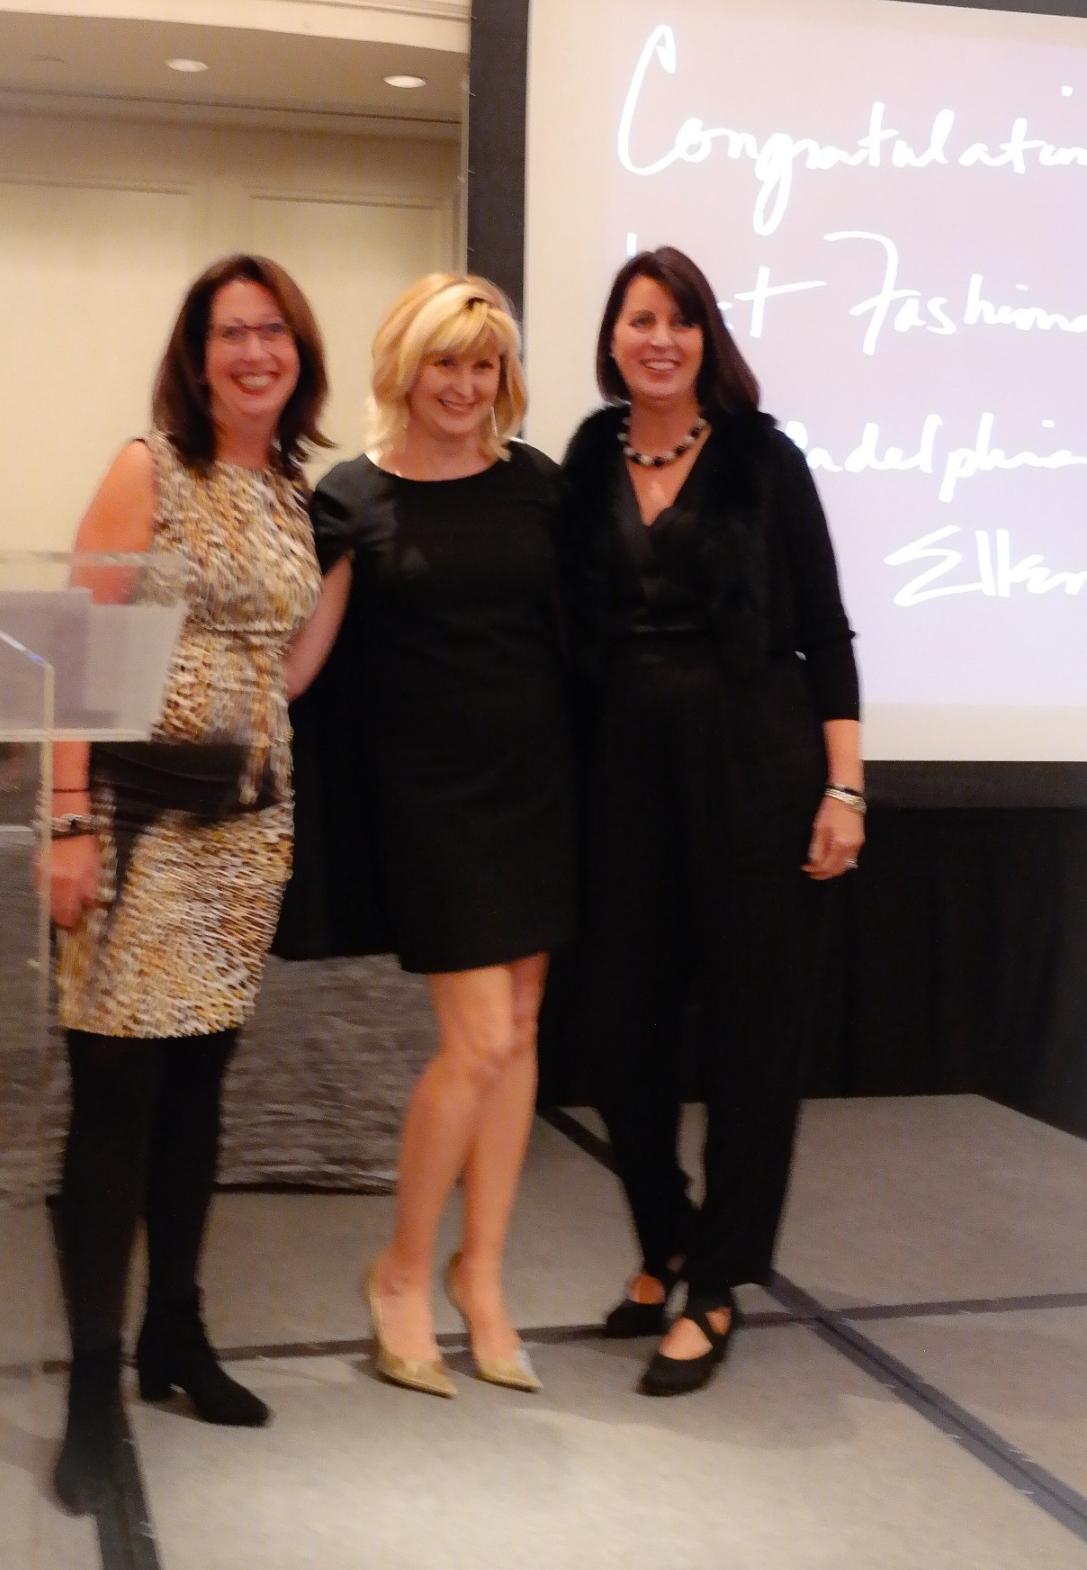 Mary K. Dougherty (Nicole Miller Philadelphia) on stage with me (XIX Women honoree Doreen Creede) and Janice Waitkus (LAGOS). (PHOTO: Denise Schwemmer)